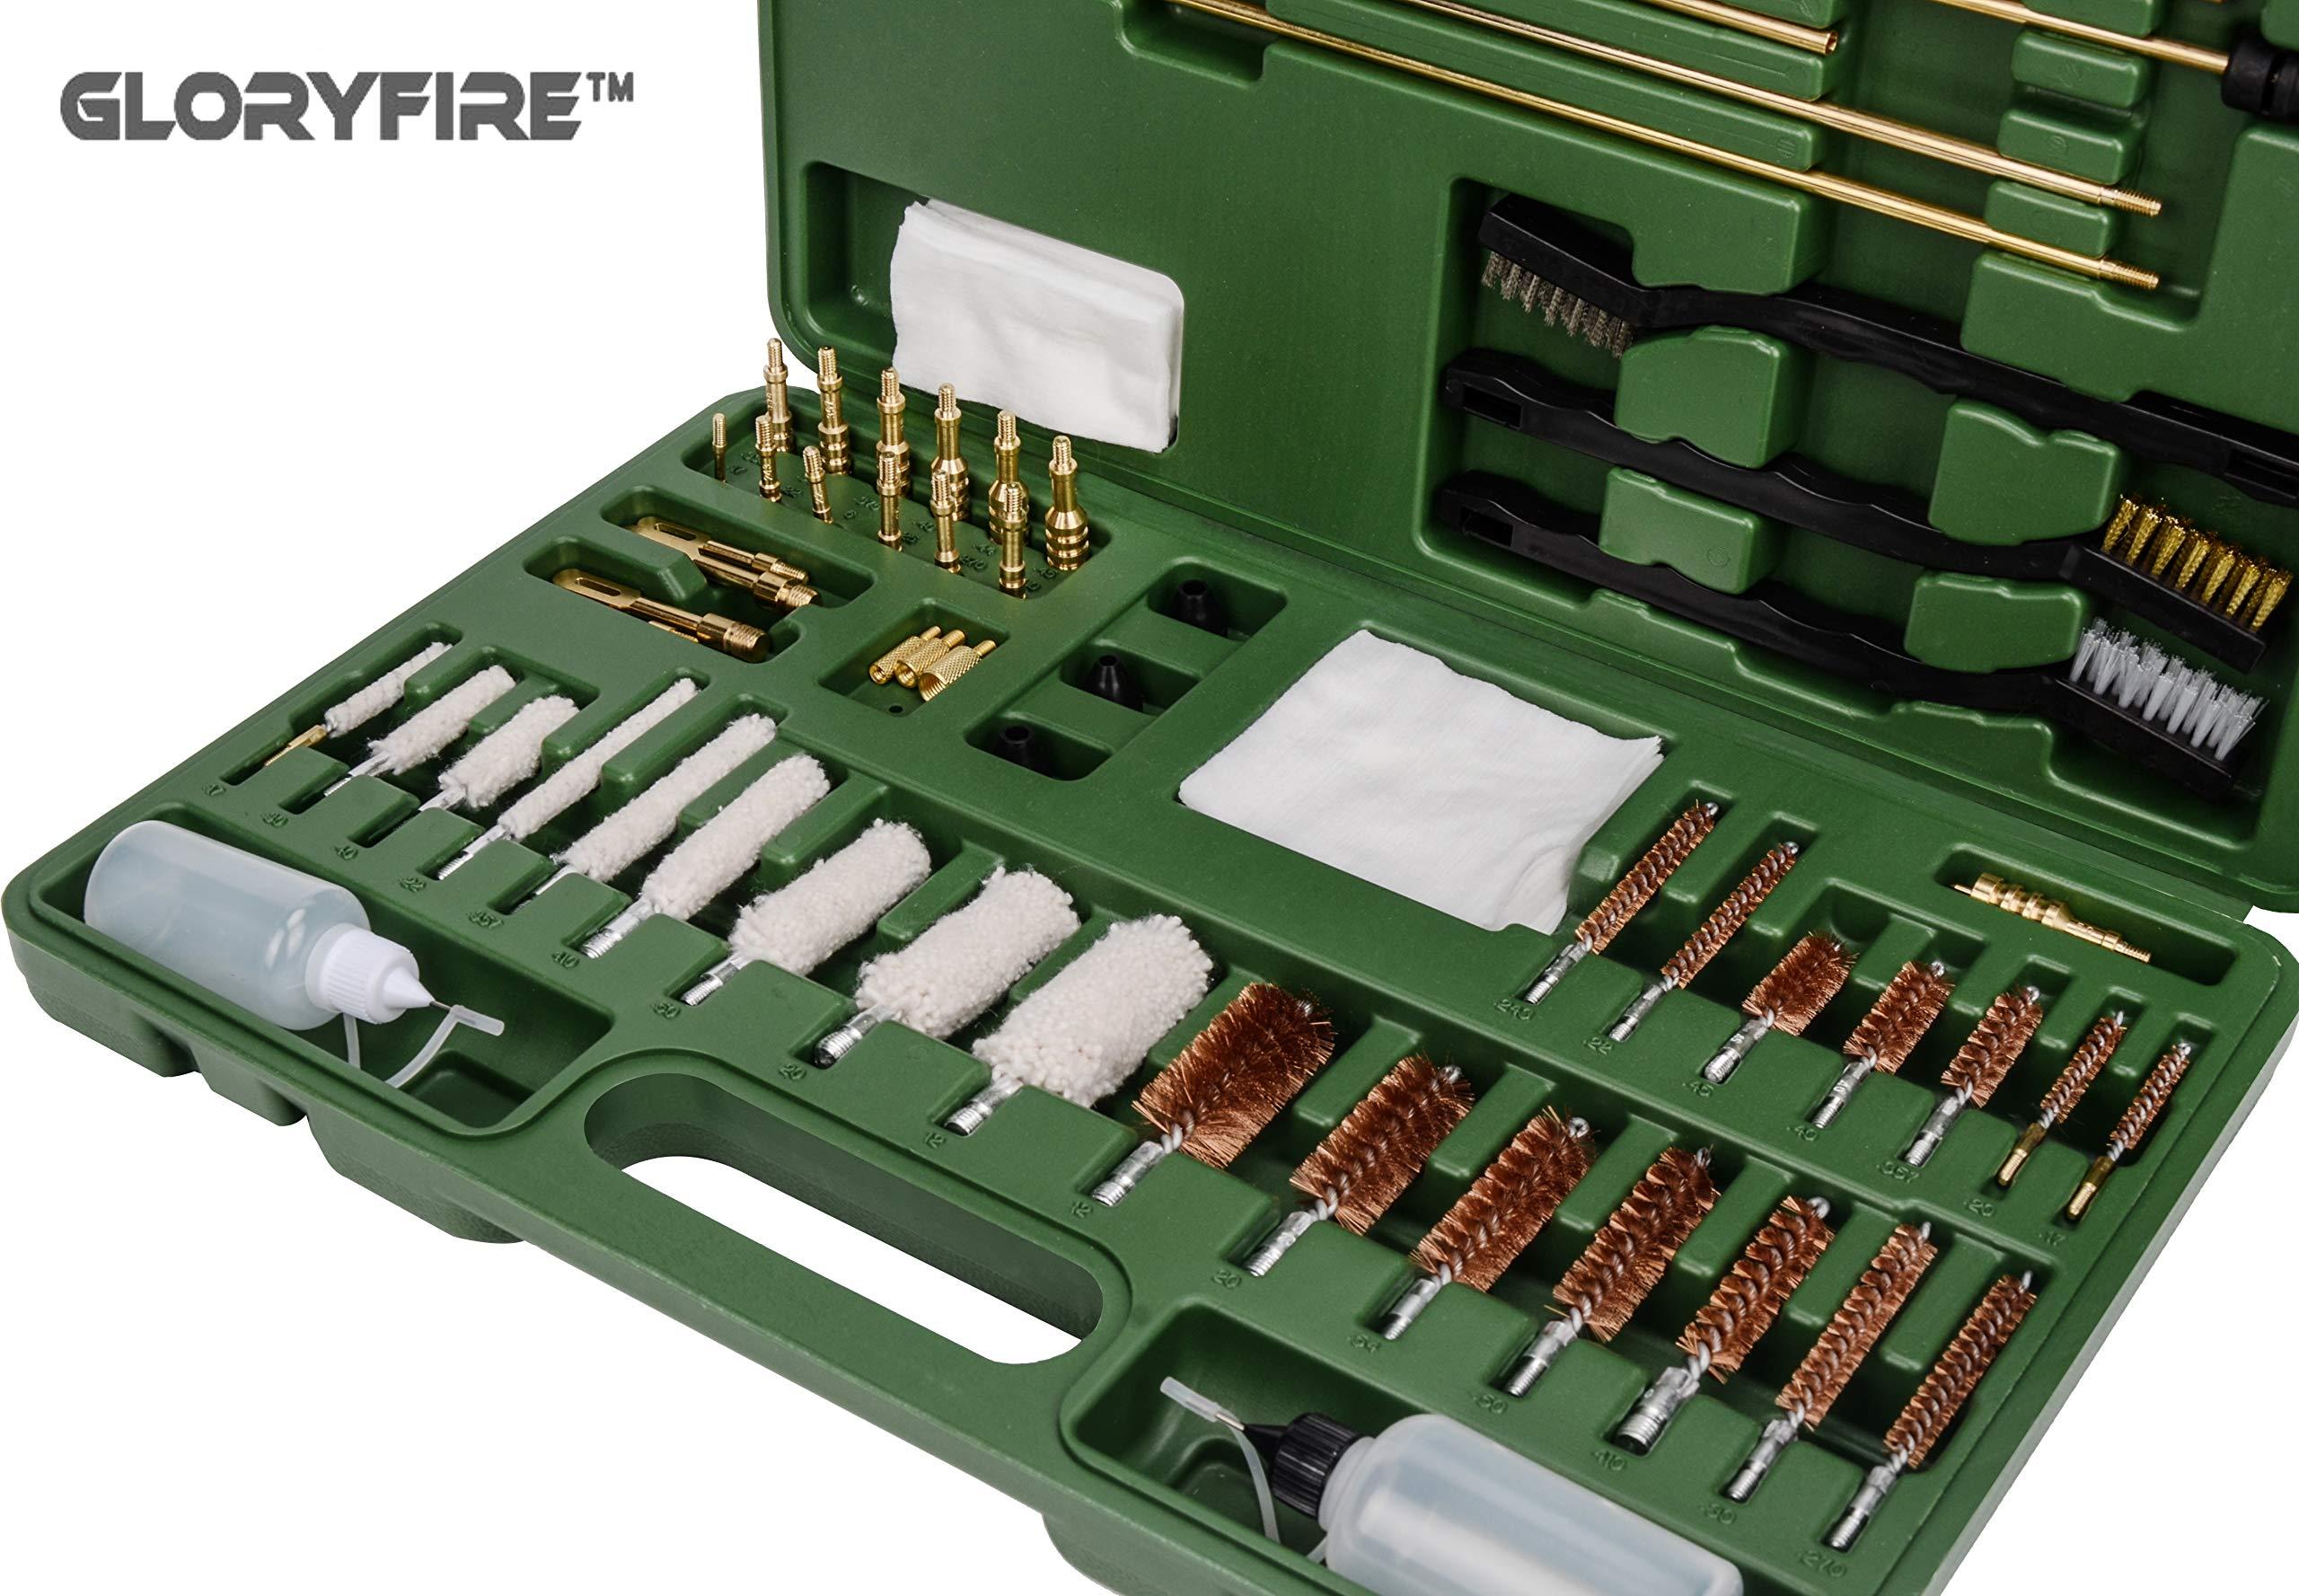 GLORYFIRE Universal Gun Cleaning Kit Hunting Rilfe Handgun Shot Gun Cleaning Kit for All Guns with Case Travel Size Portable Metal Brushes (Green 2) by GLORYFIRE (Image #8)